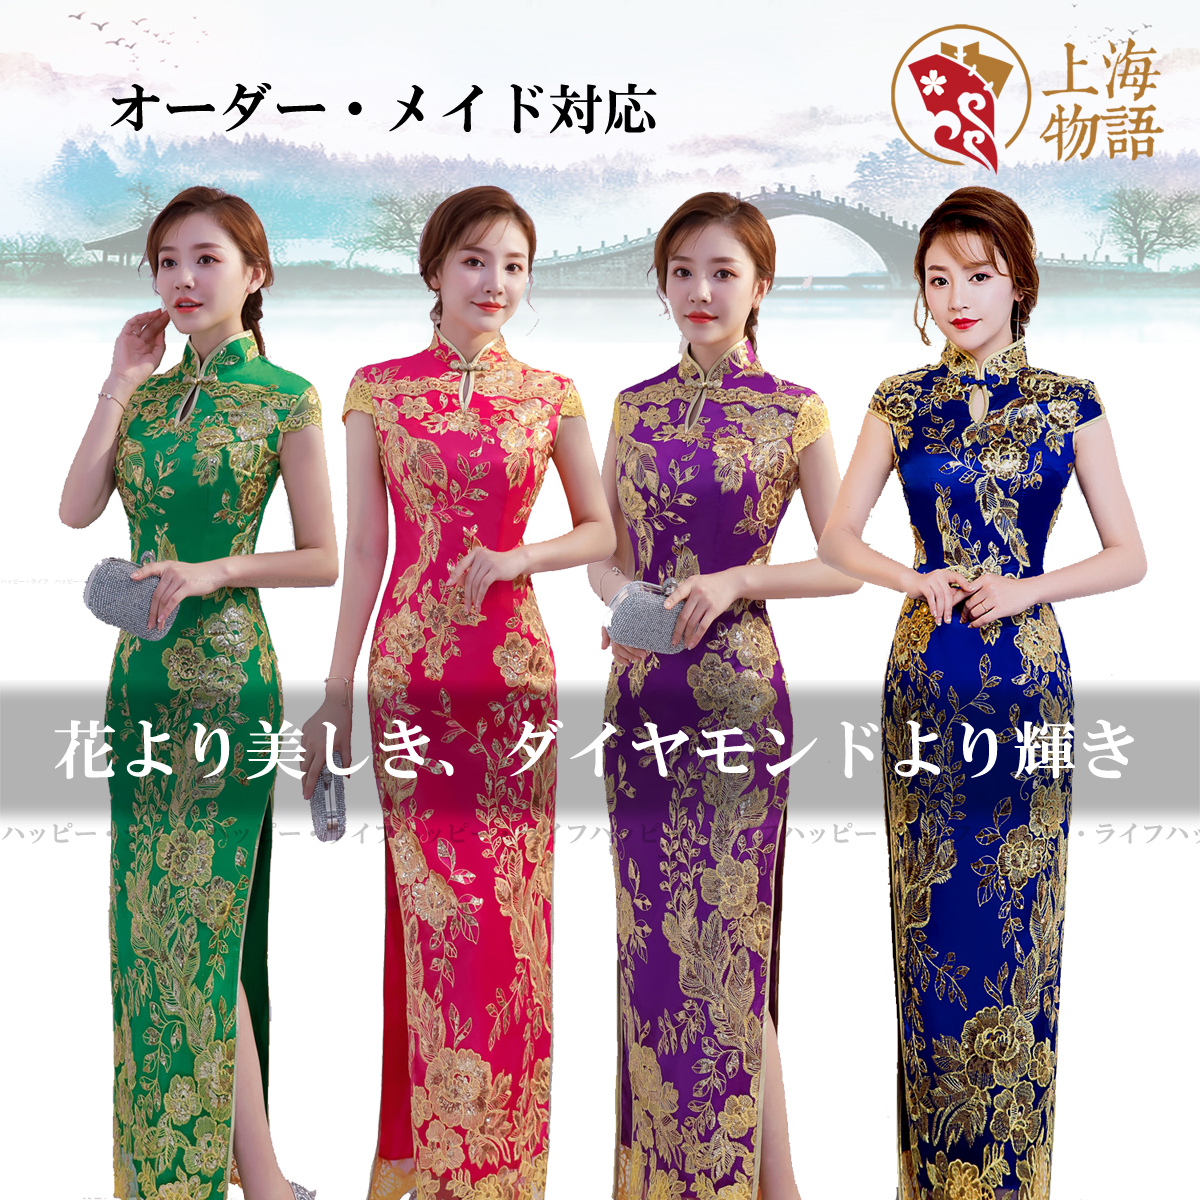 4867b850d8b4d スパンコール チャイナドレス 刺繍 レース 立ち襟 花柄半袖 刺繍 レース スパンコール スプリット 立ち襟